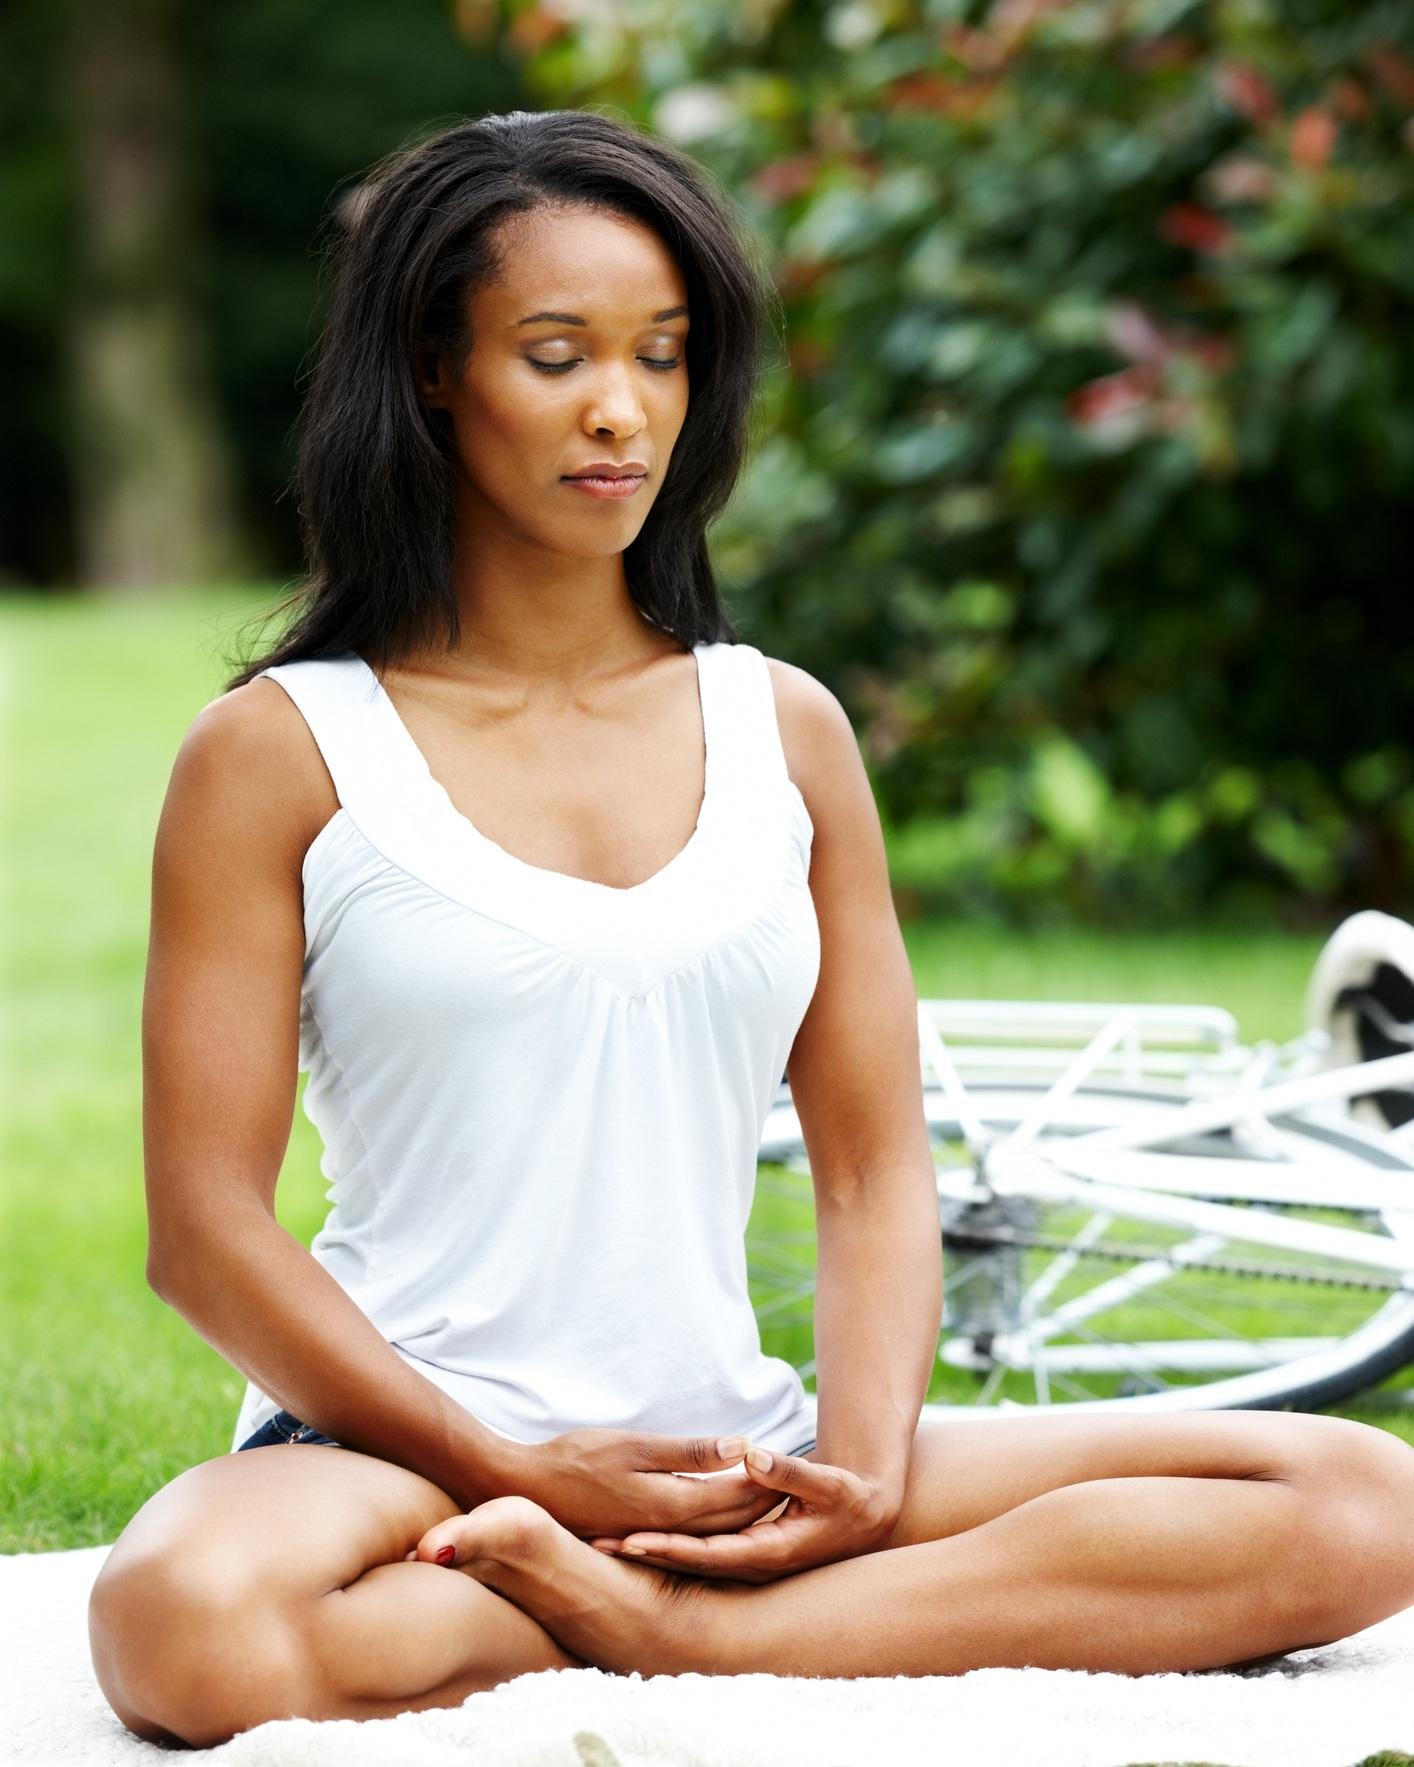 Black+Woman+Yoga.jpg